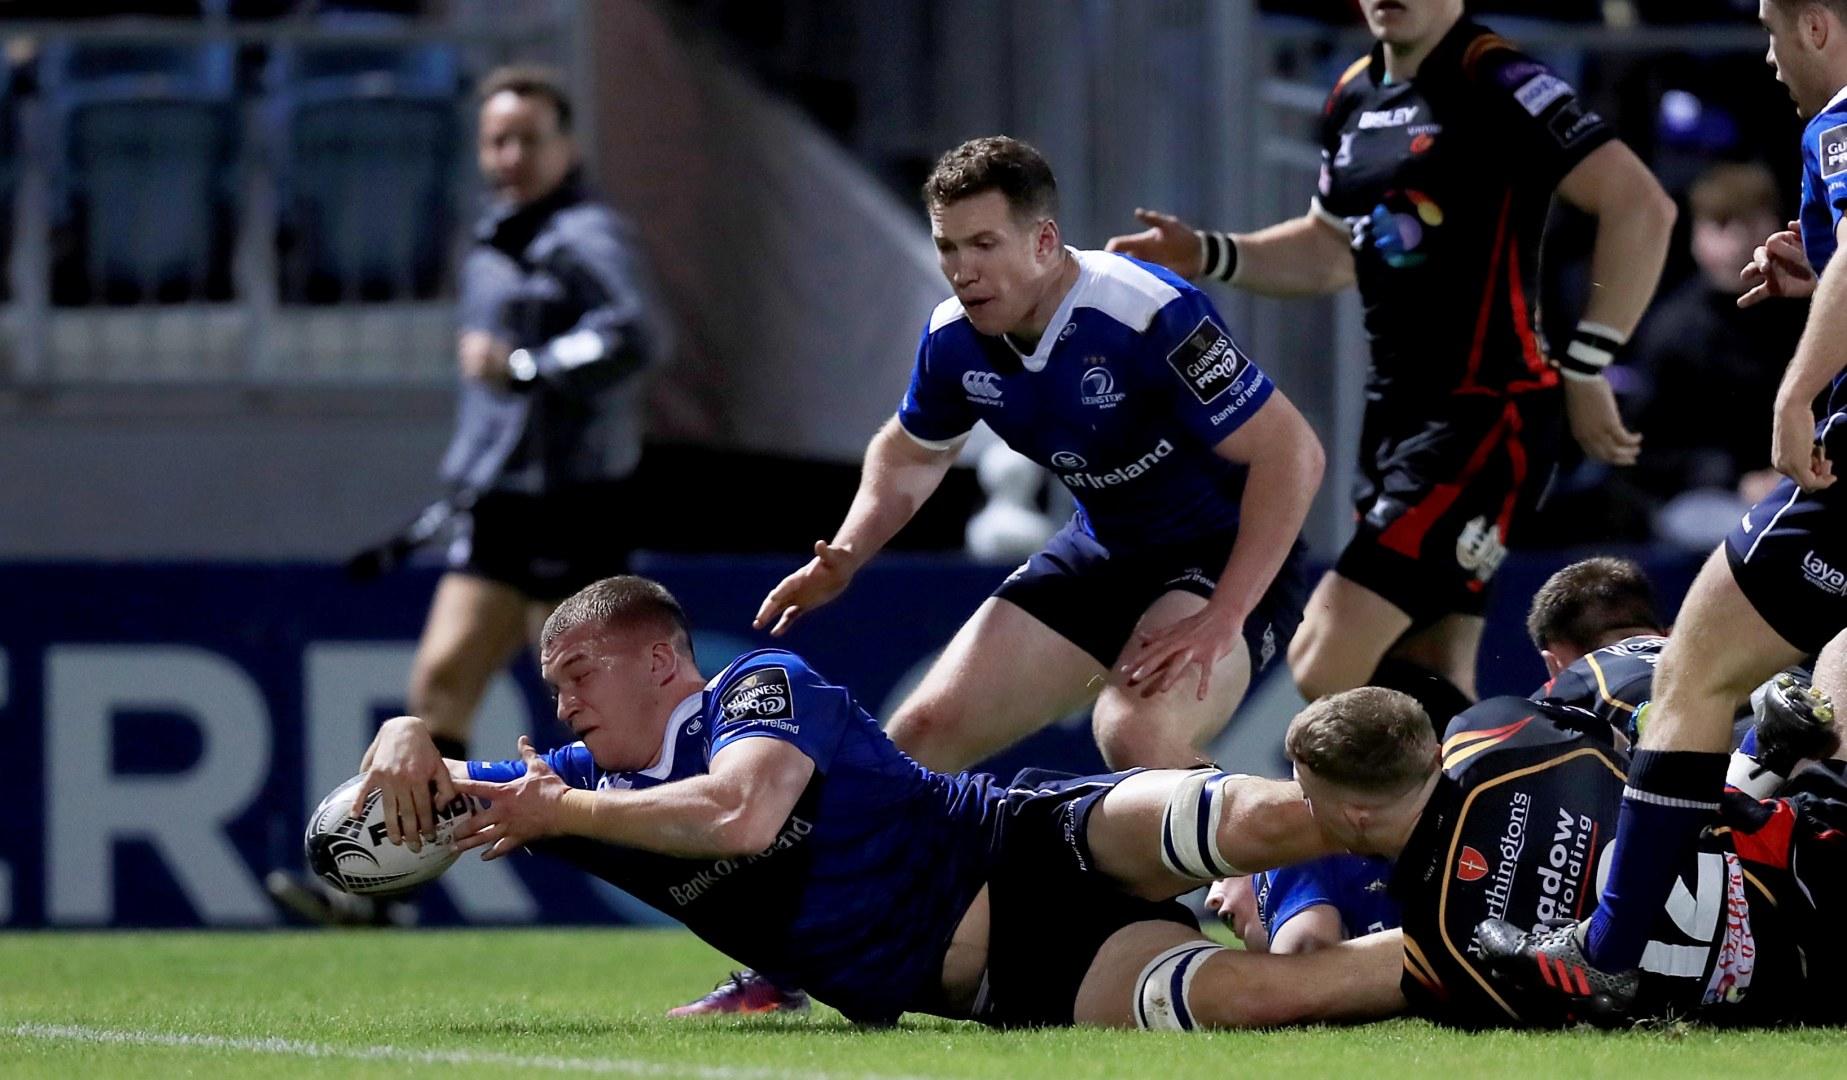 LionsWatch: Aviva Premiership stars return as Leinster keep up the pace